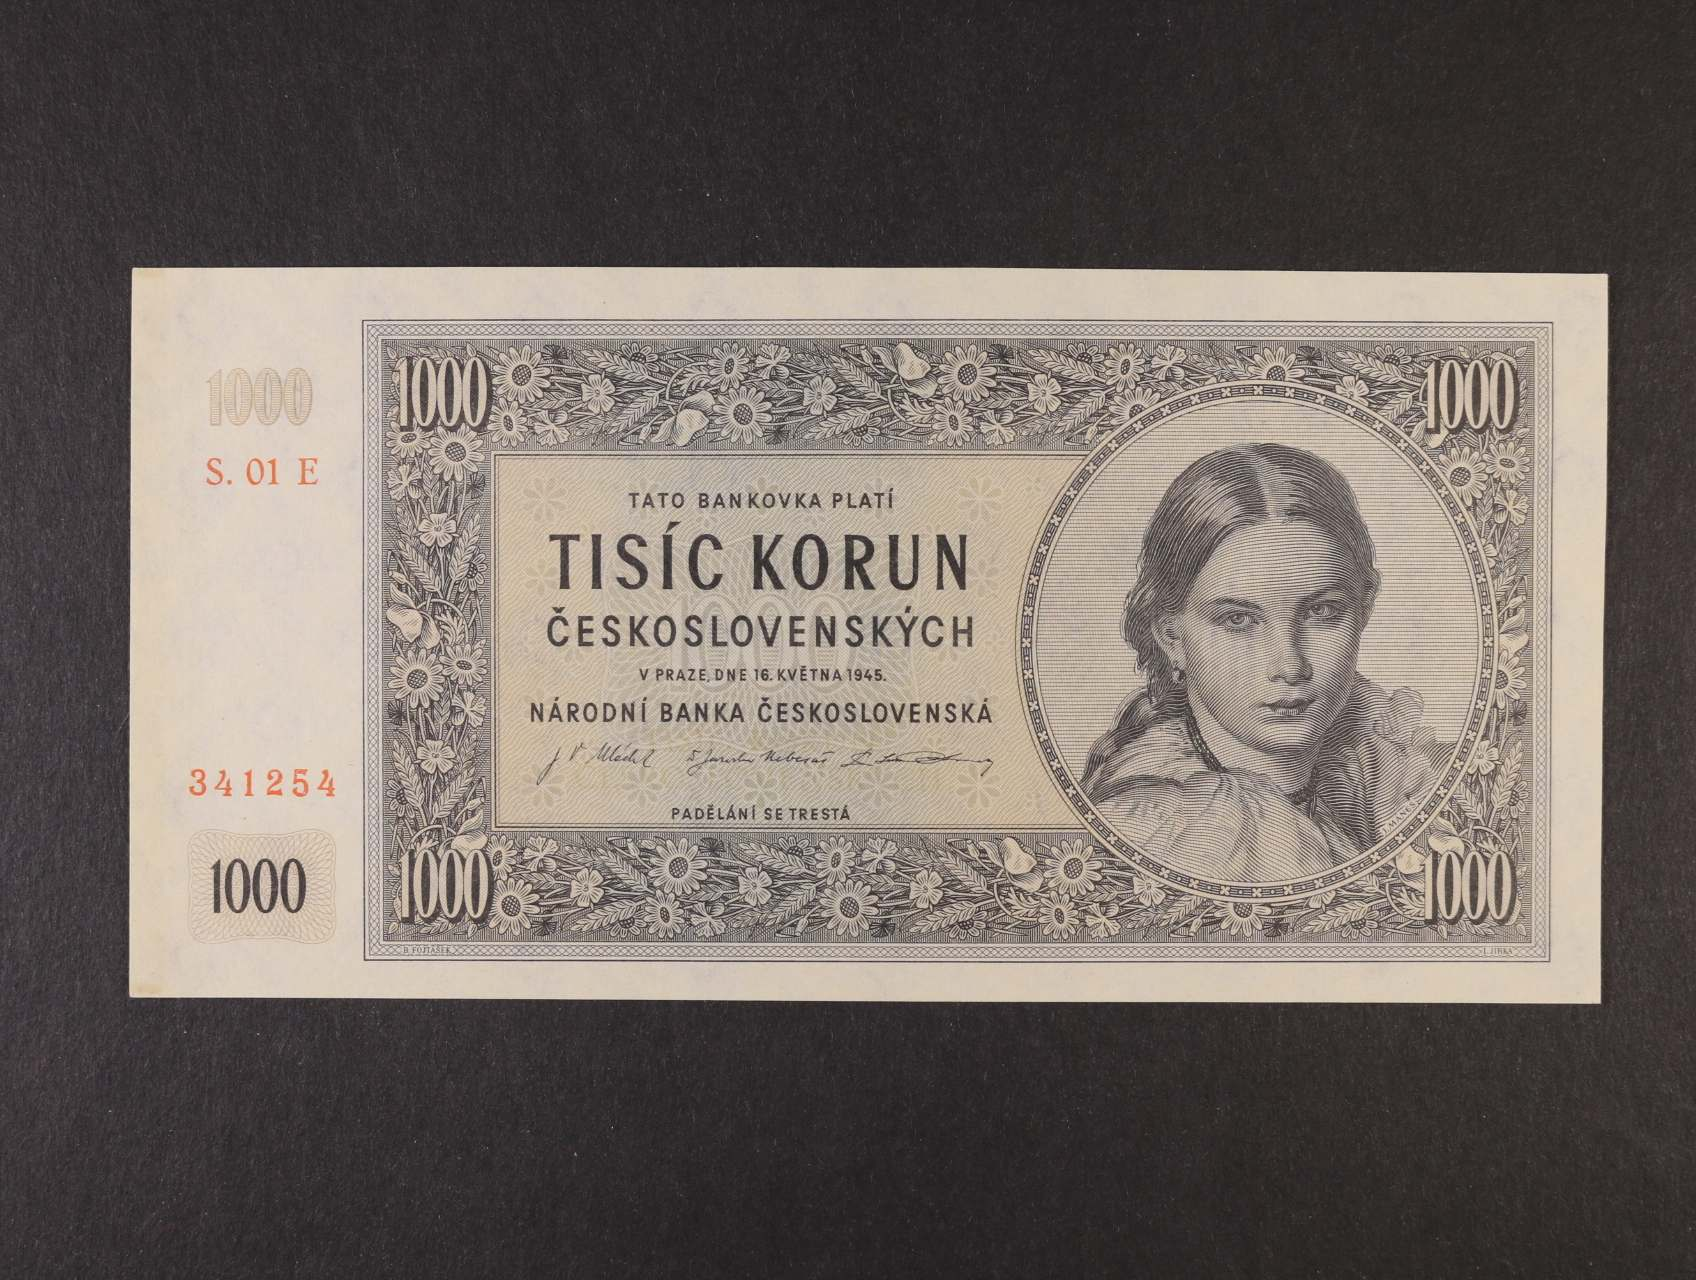 1000 Kčs 16.5.1945 série 01 E, Ba. 78d, Pi. 74d